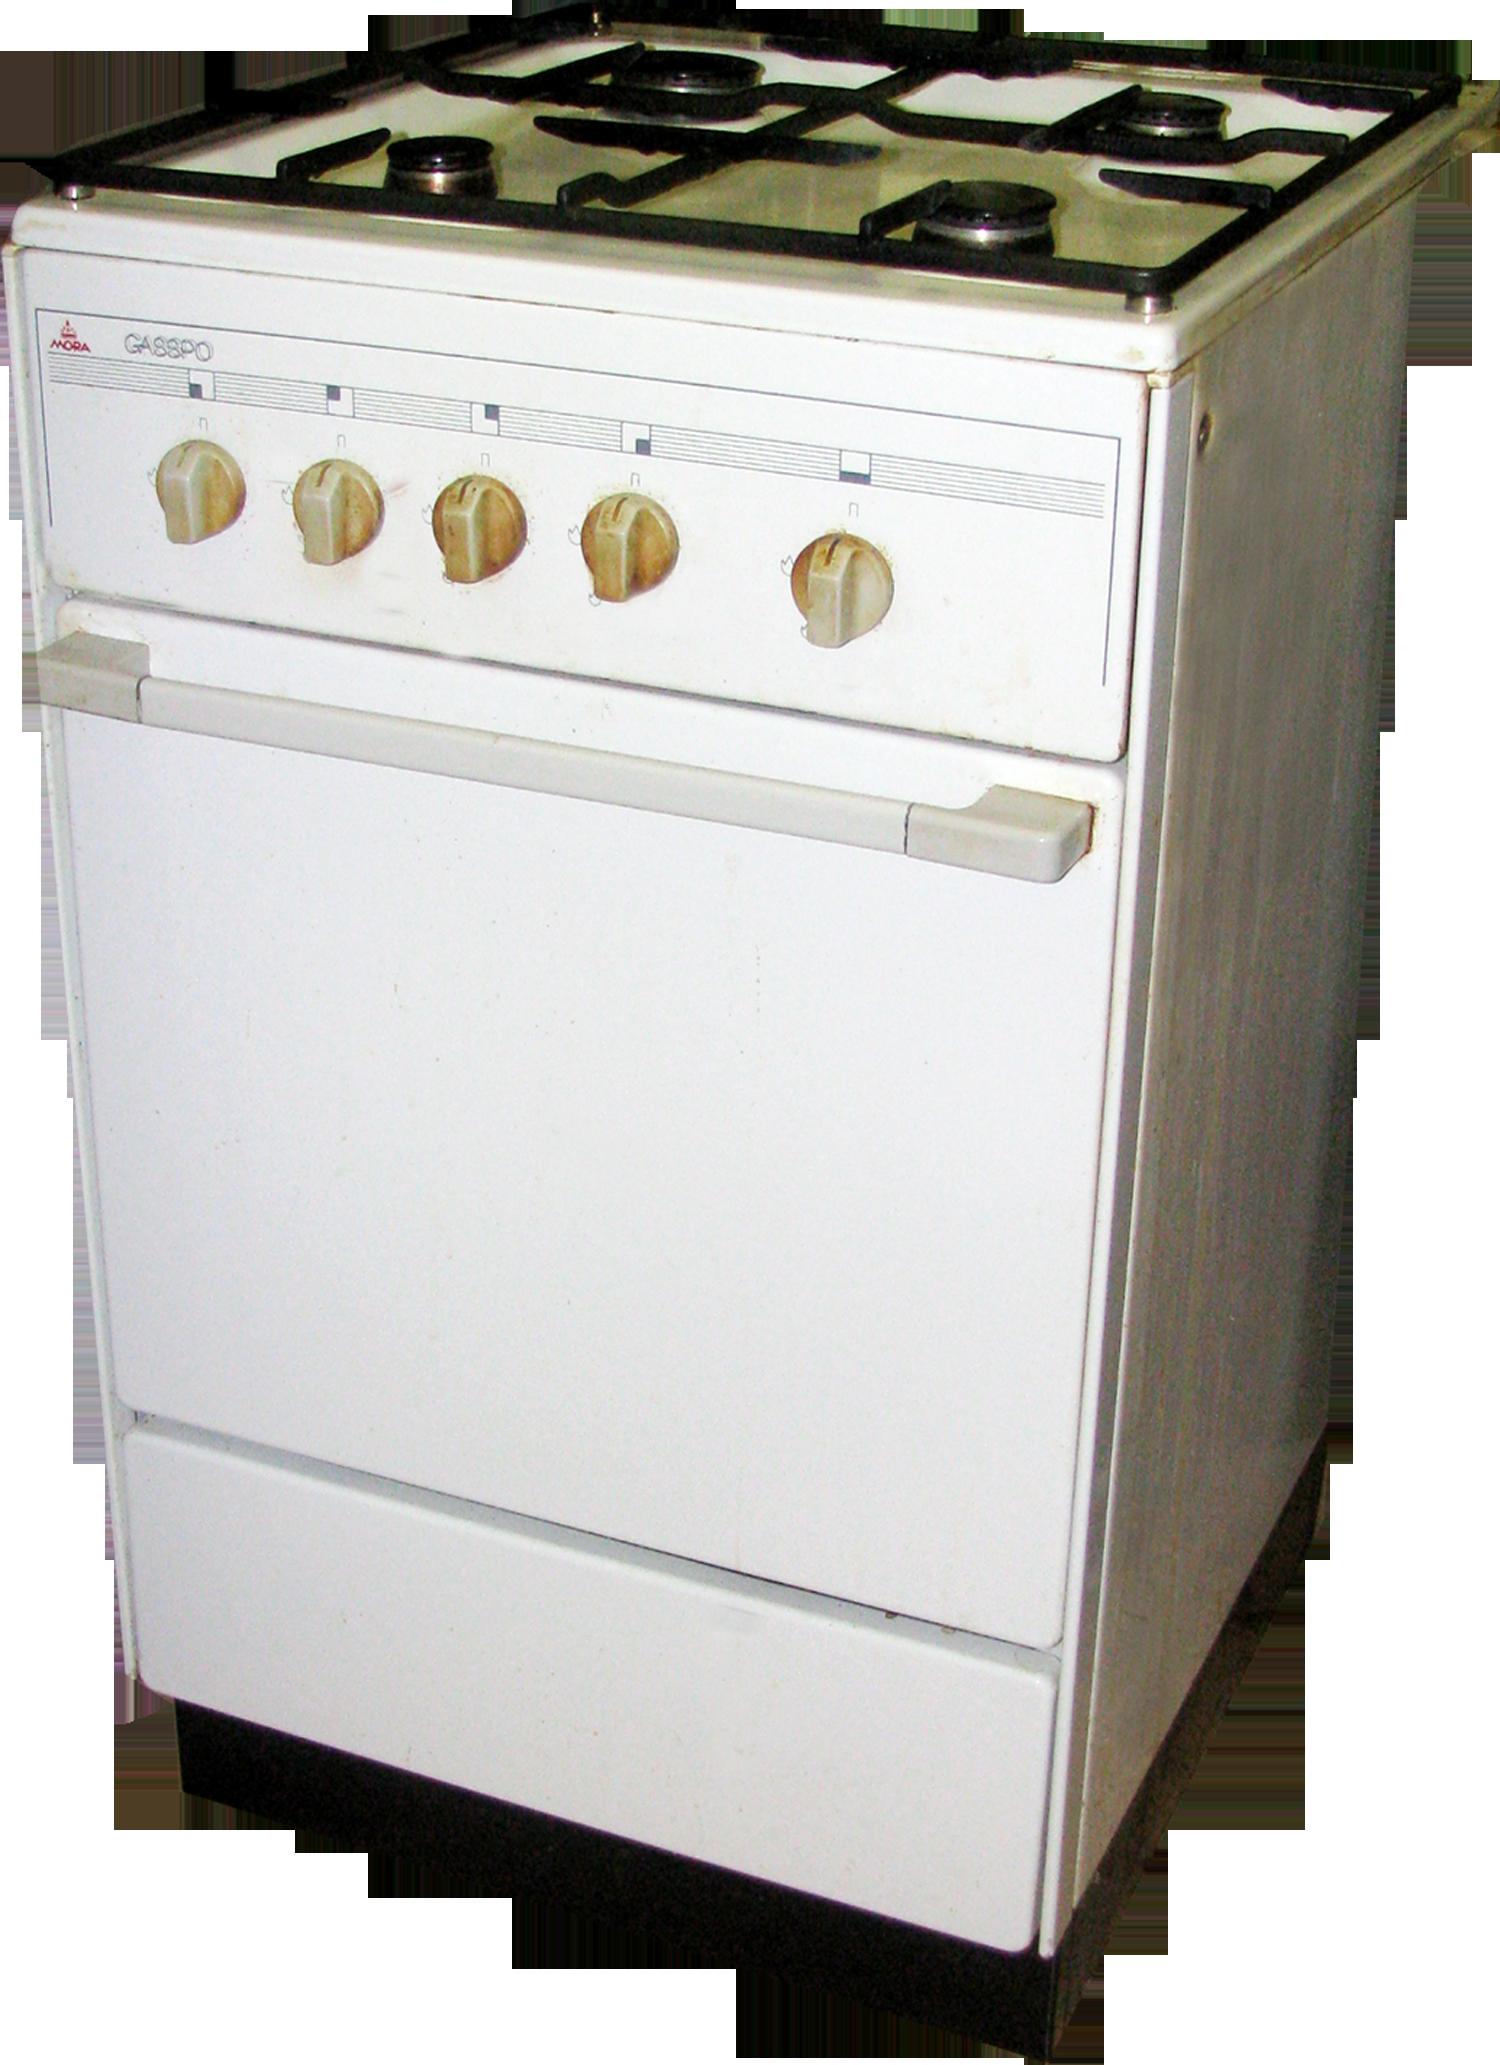 Gas clipart gas range. Stove kitchen washing machine